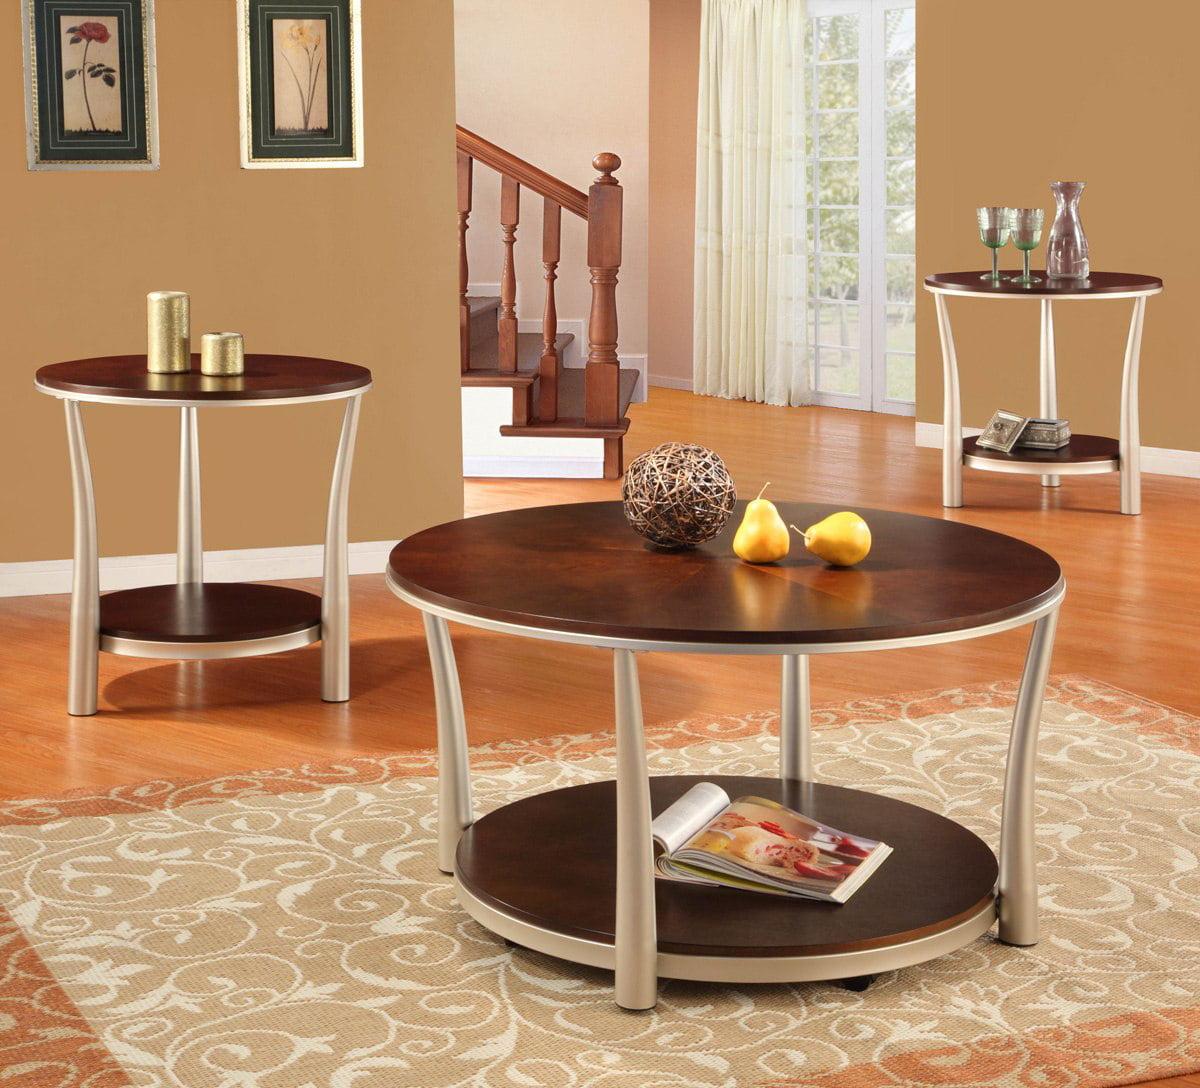 Homelegance P. Allred 3 Piece Coffee Table Set w/ Nickel Legs